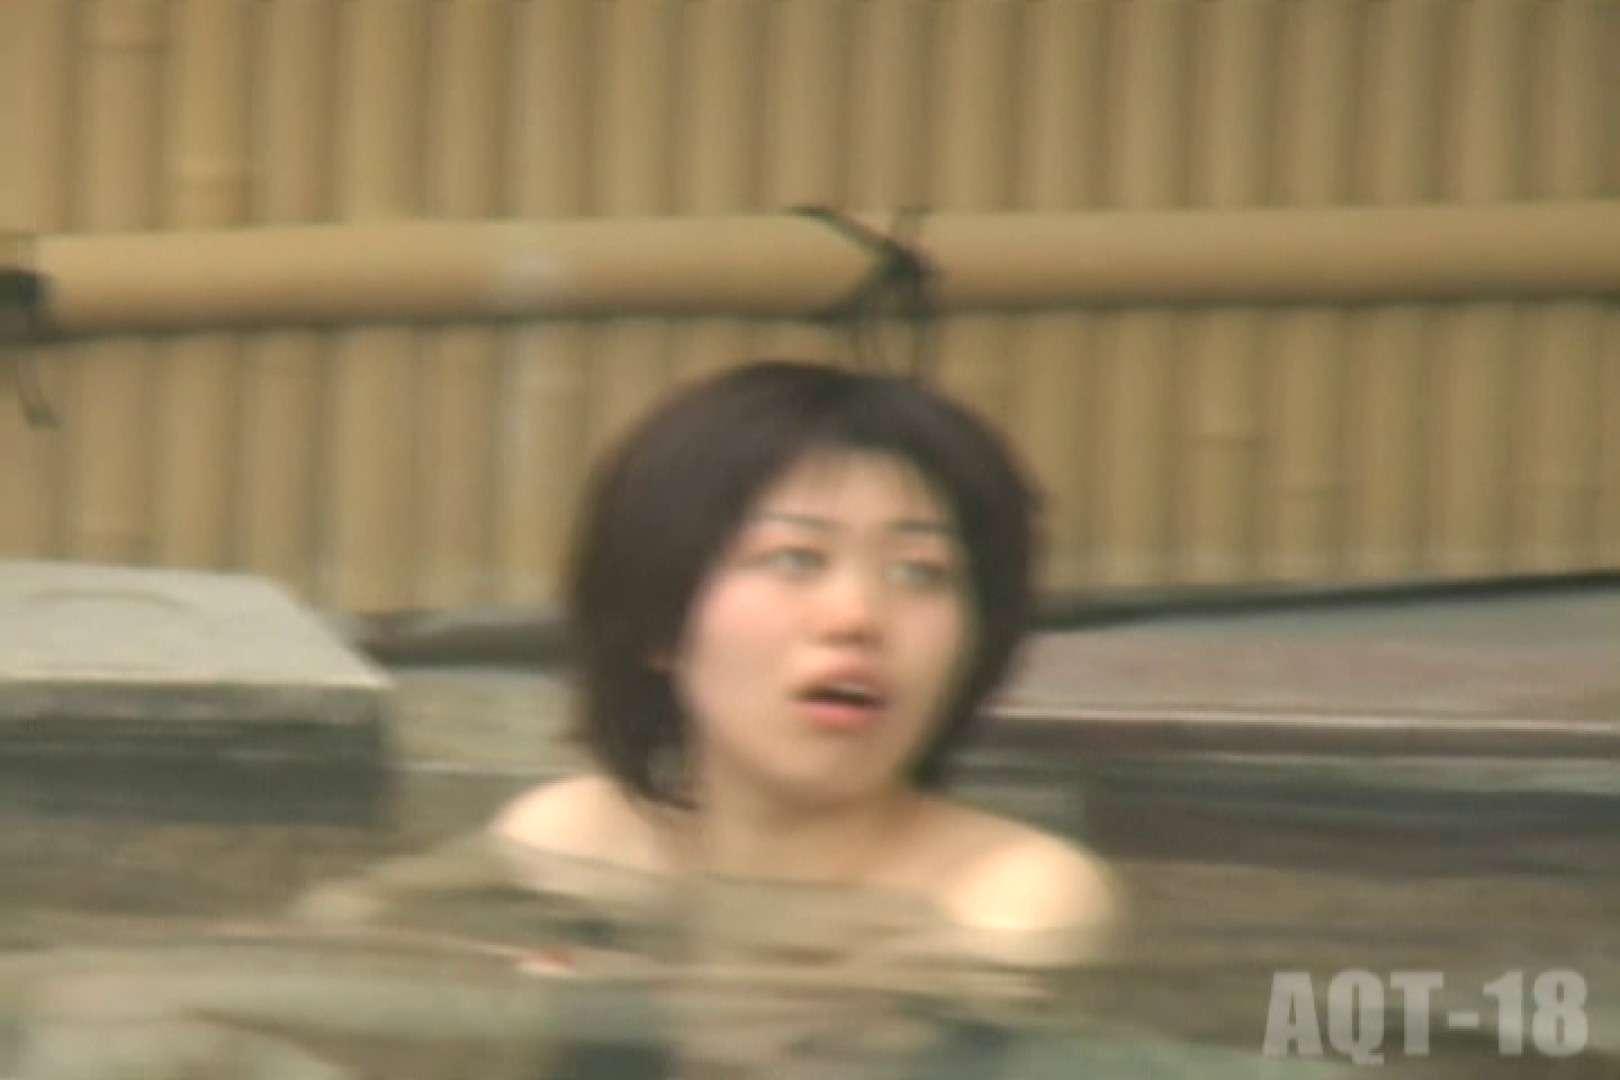 Aquaな露天風呂Vol.861 露天風呂 オメコ無修正動画無料 107連発 32